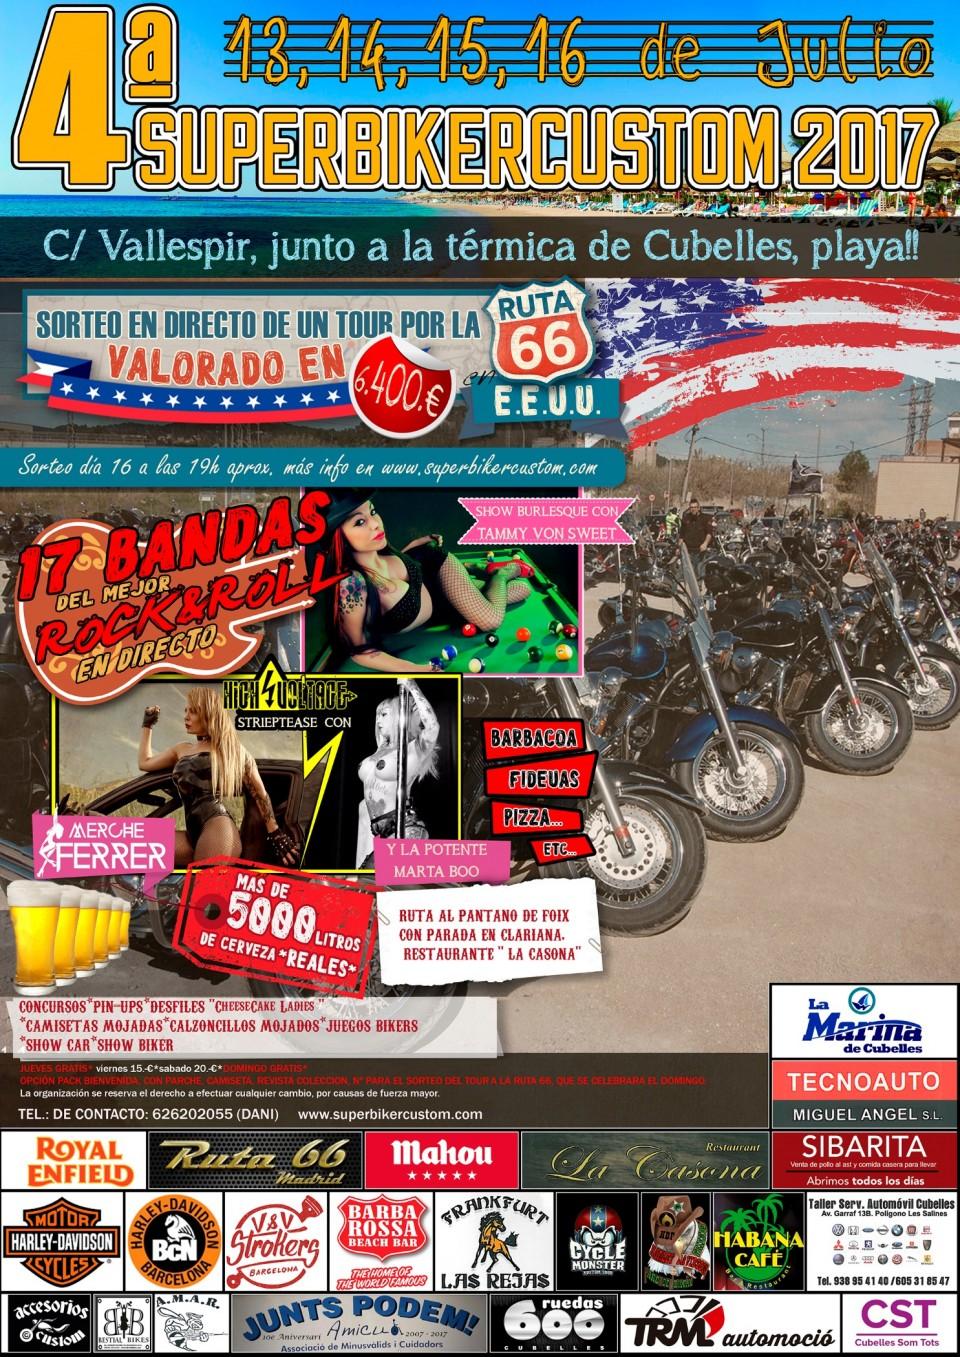 30 septiembre Lugo